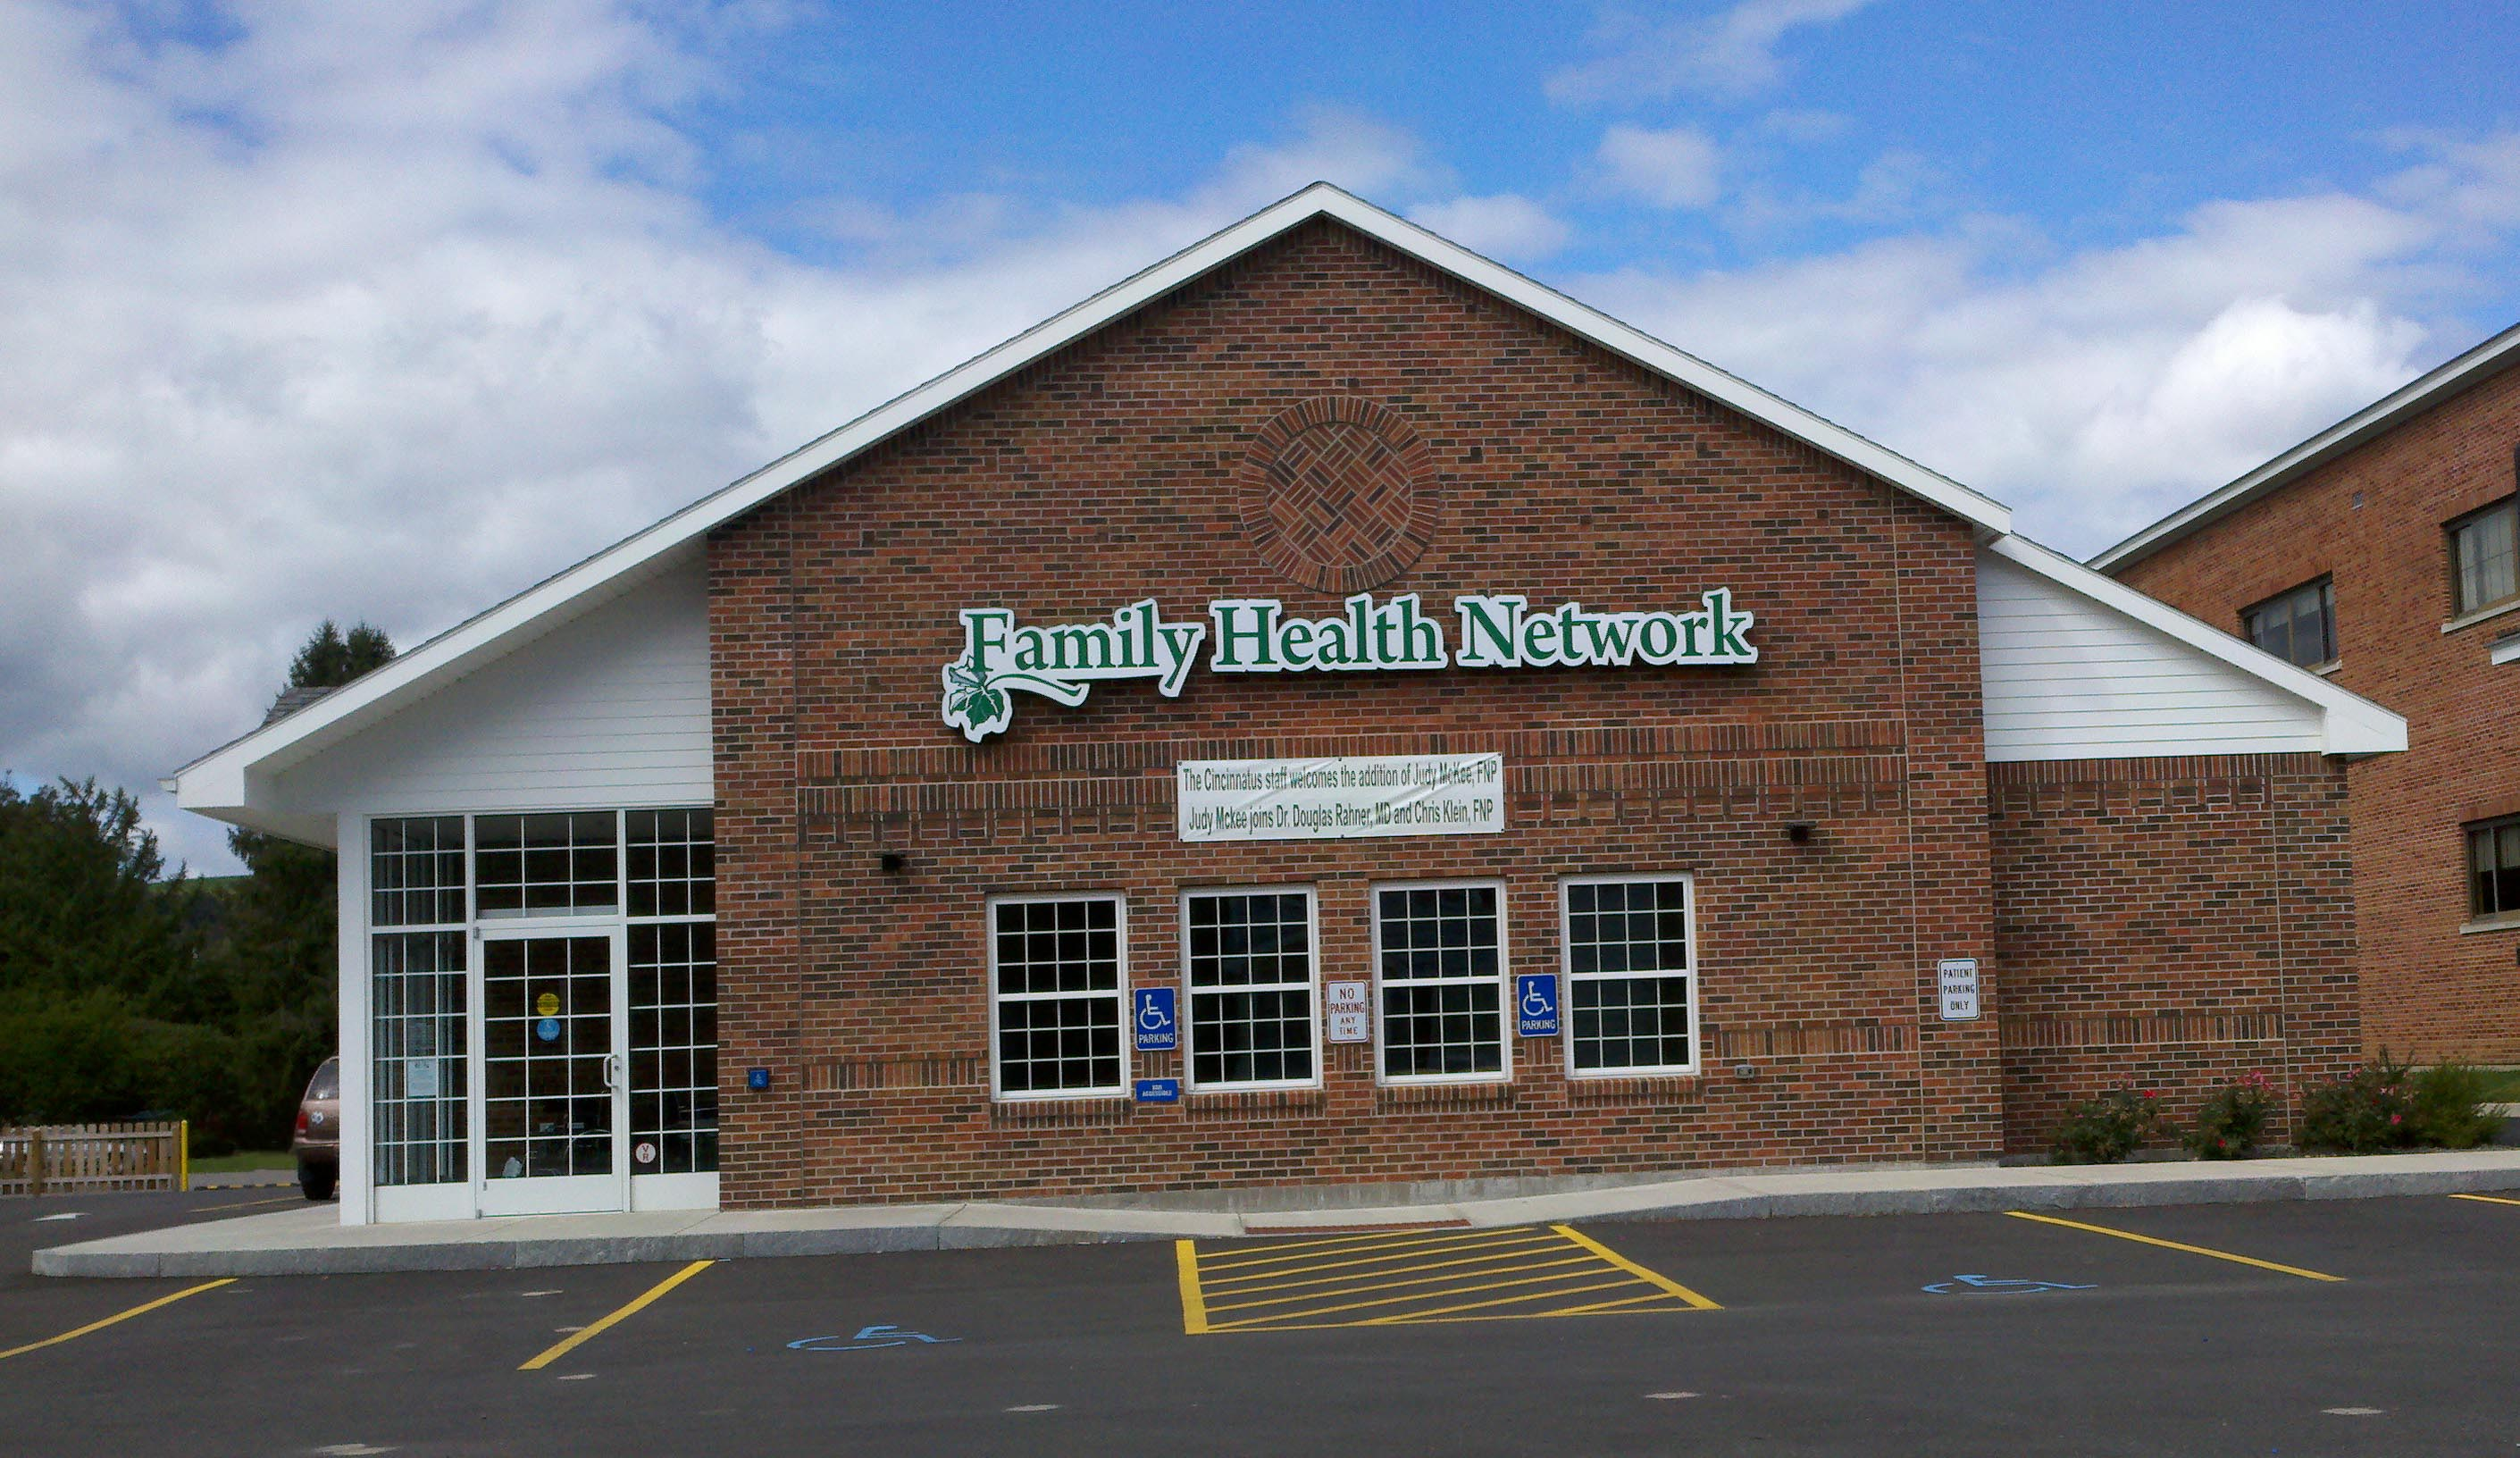 Family Health Network